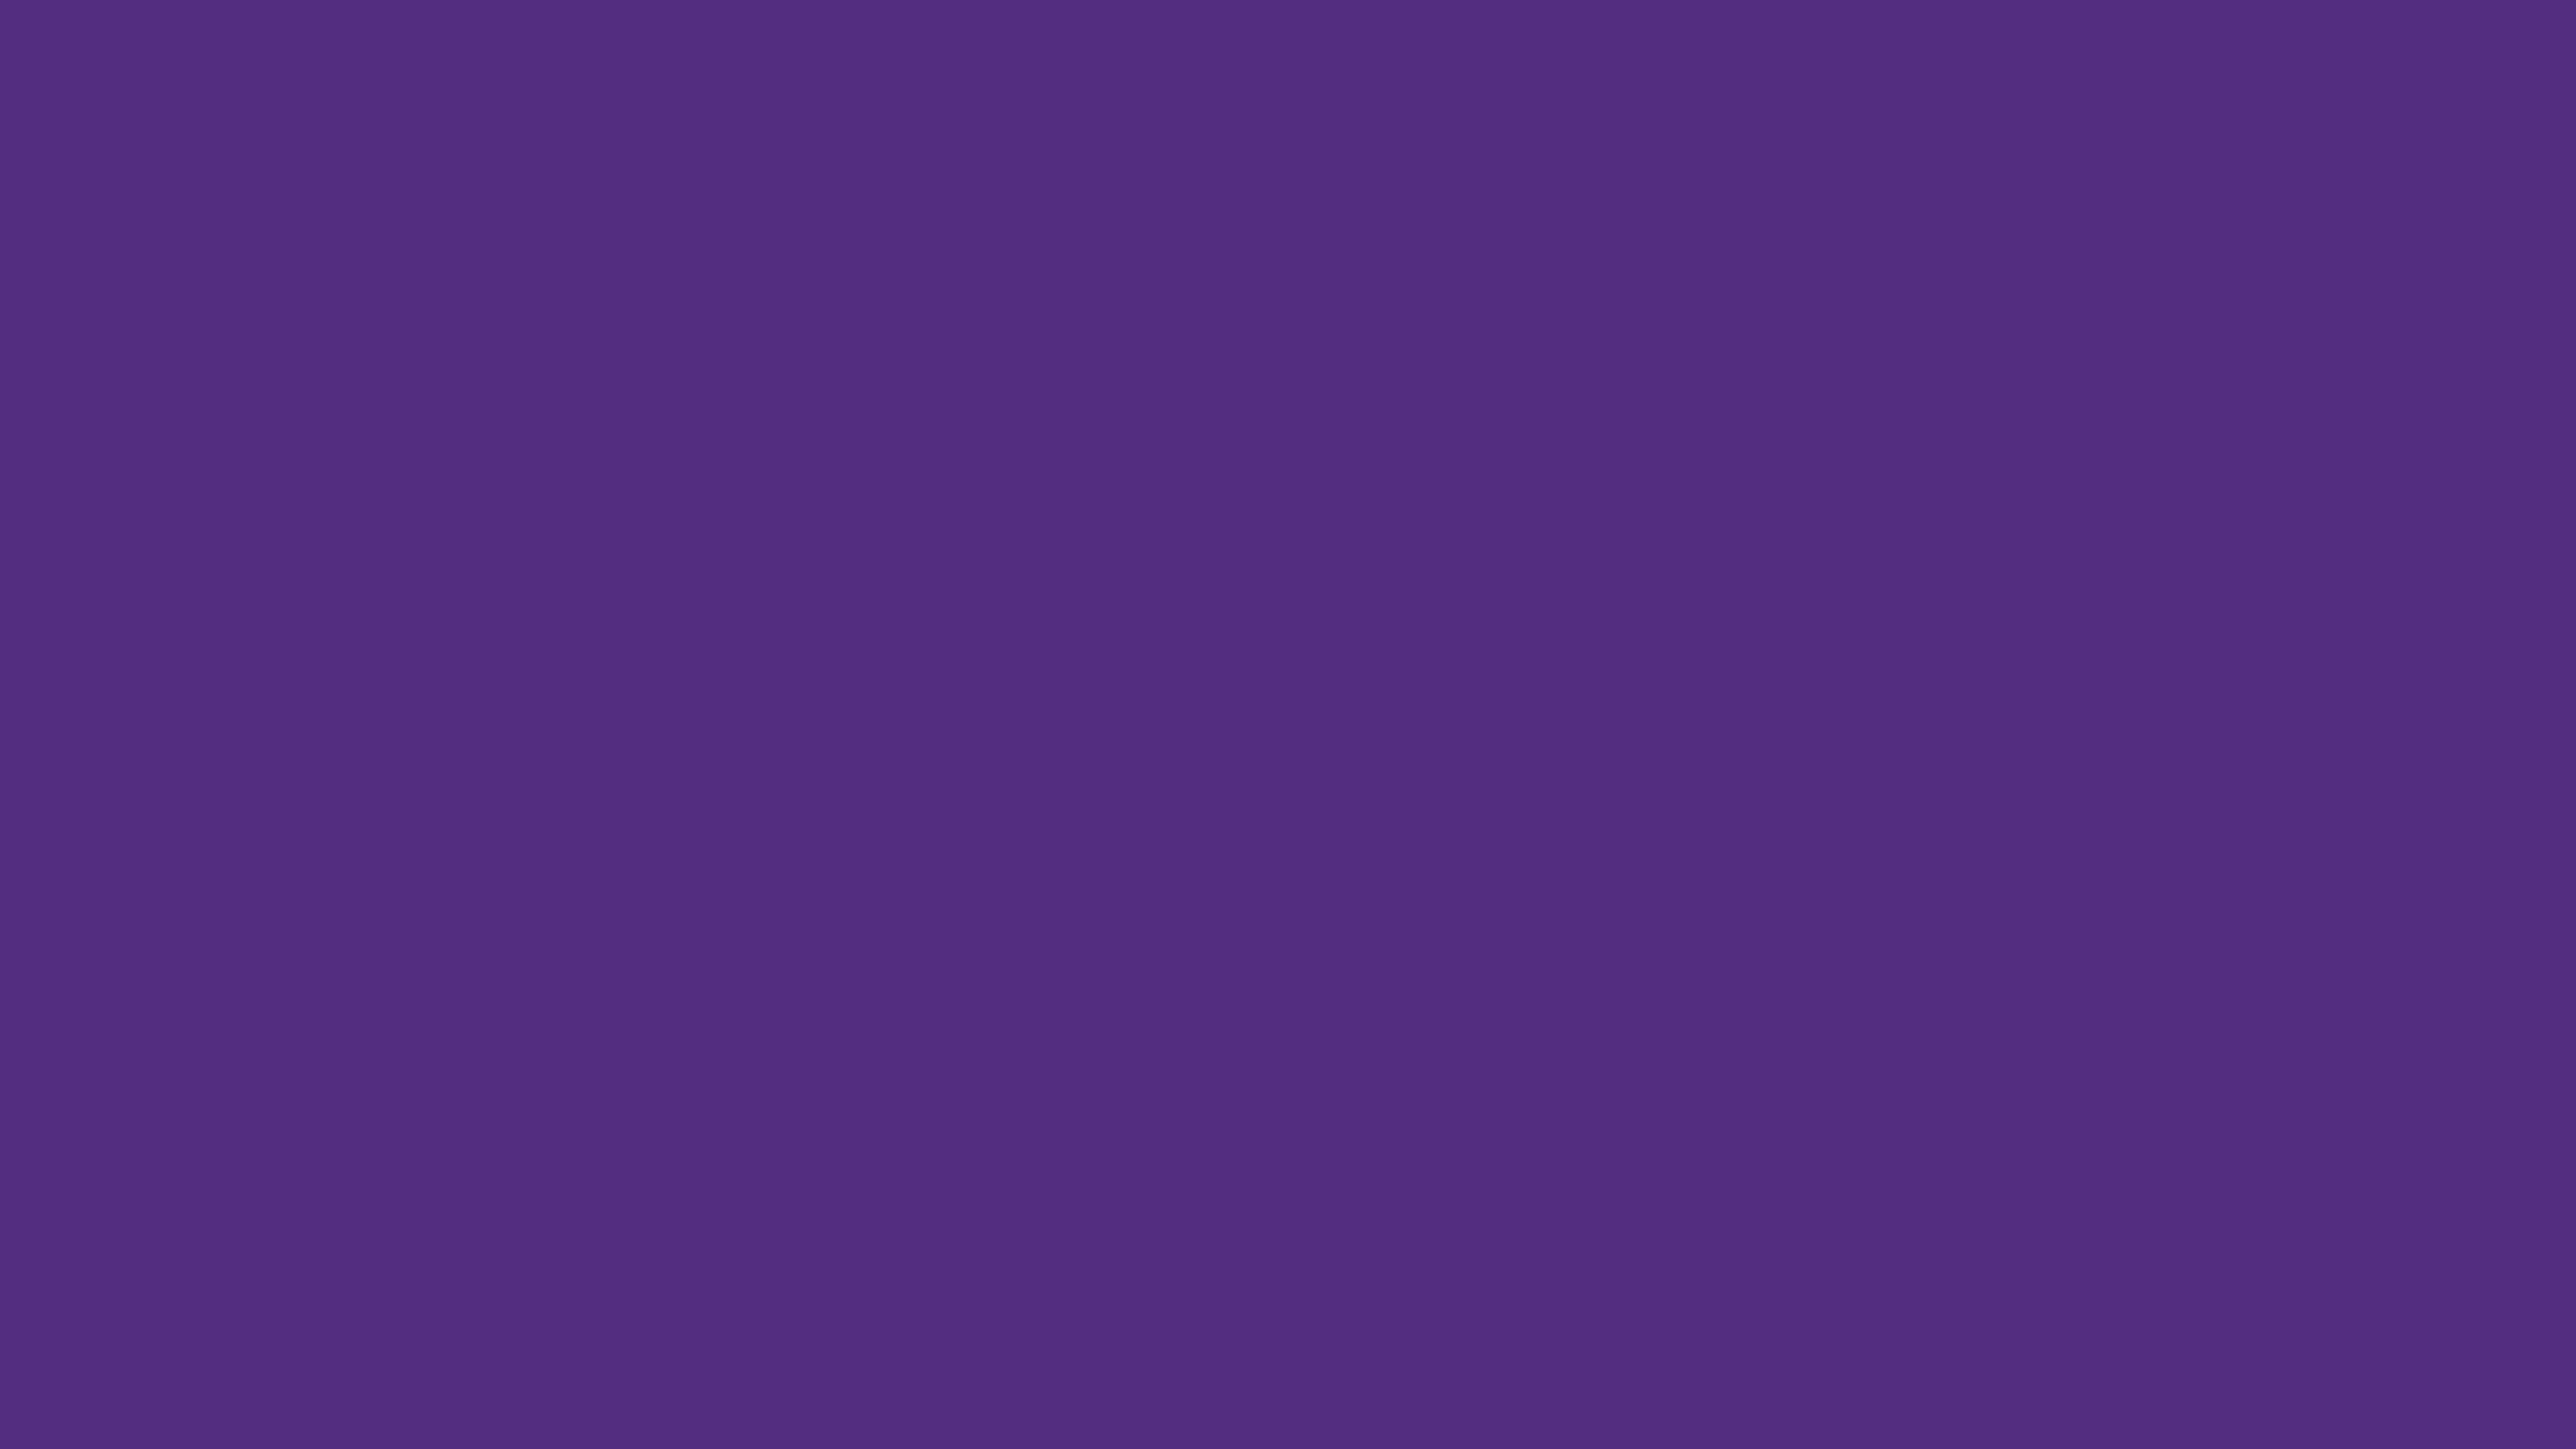 4096x2304 Regalia Solid Color Background